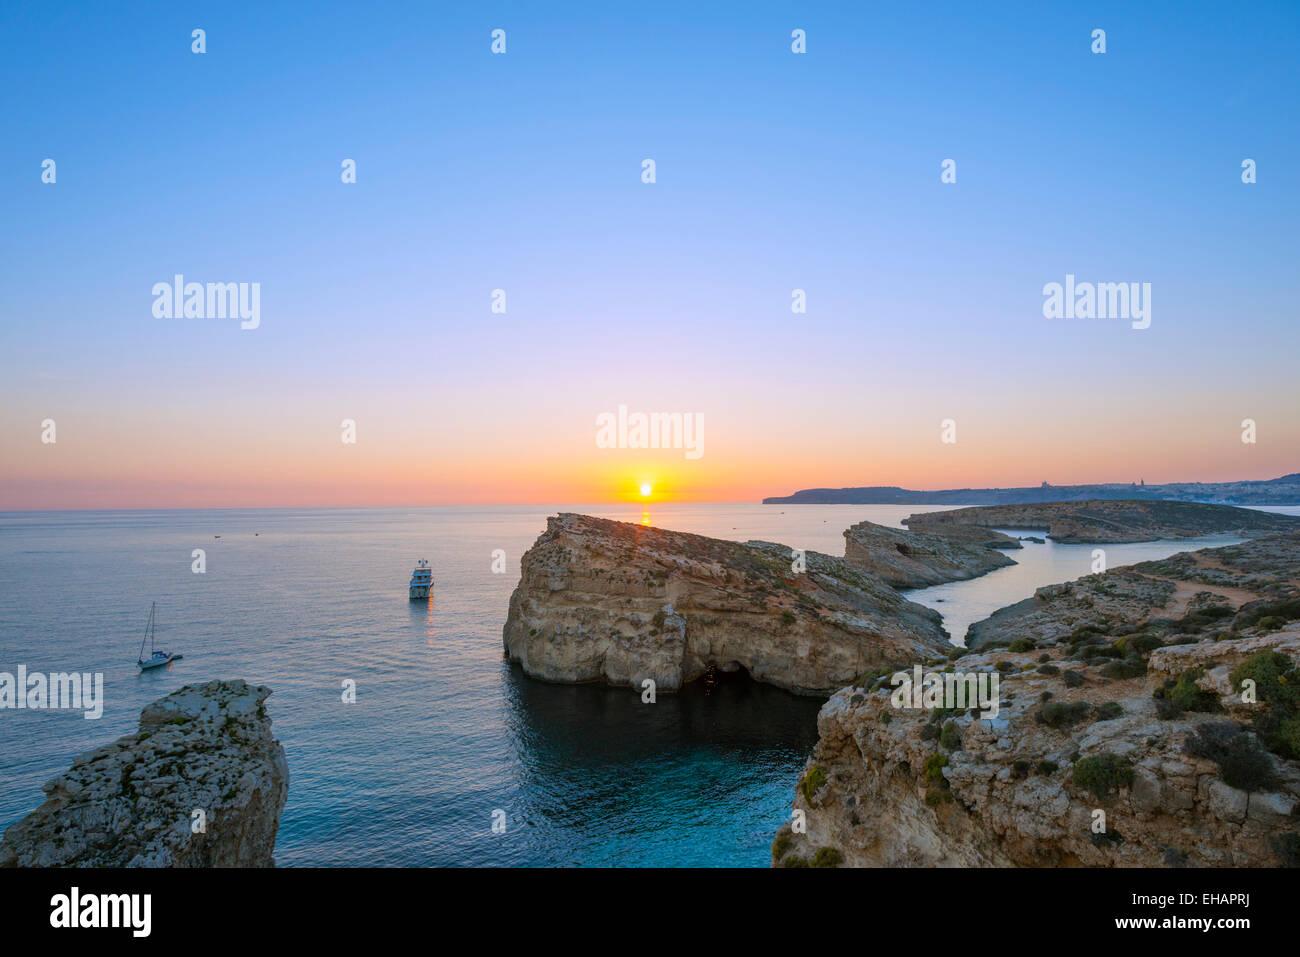 La Europa del Mediterráneo, Malta, isla de Comino, sunset Imagen De Stock